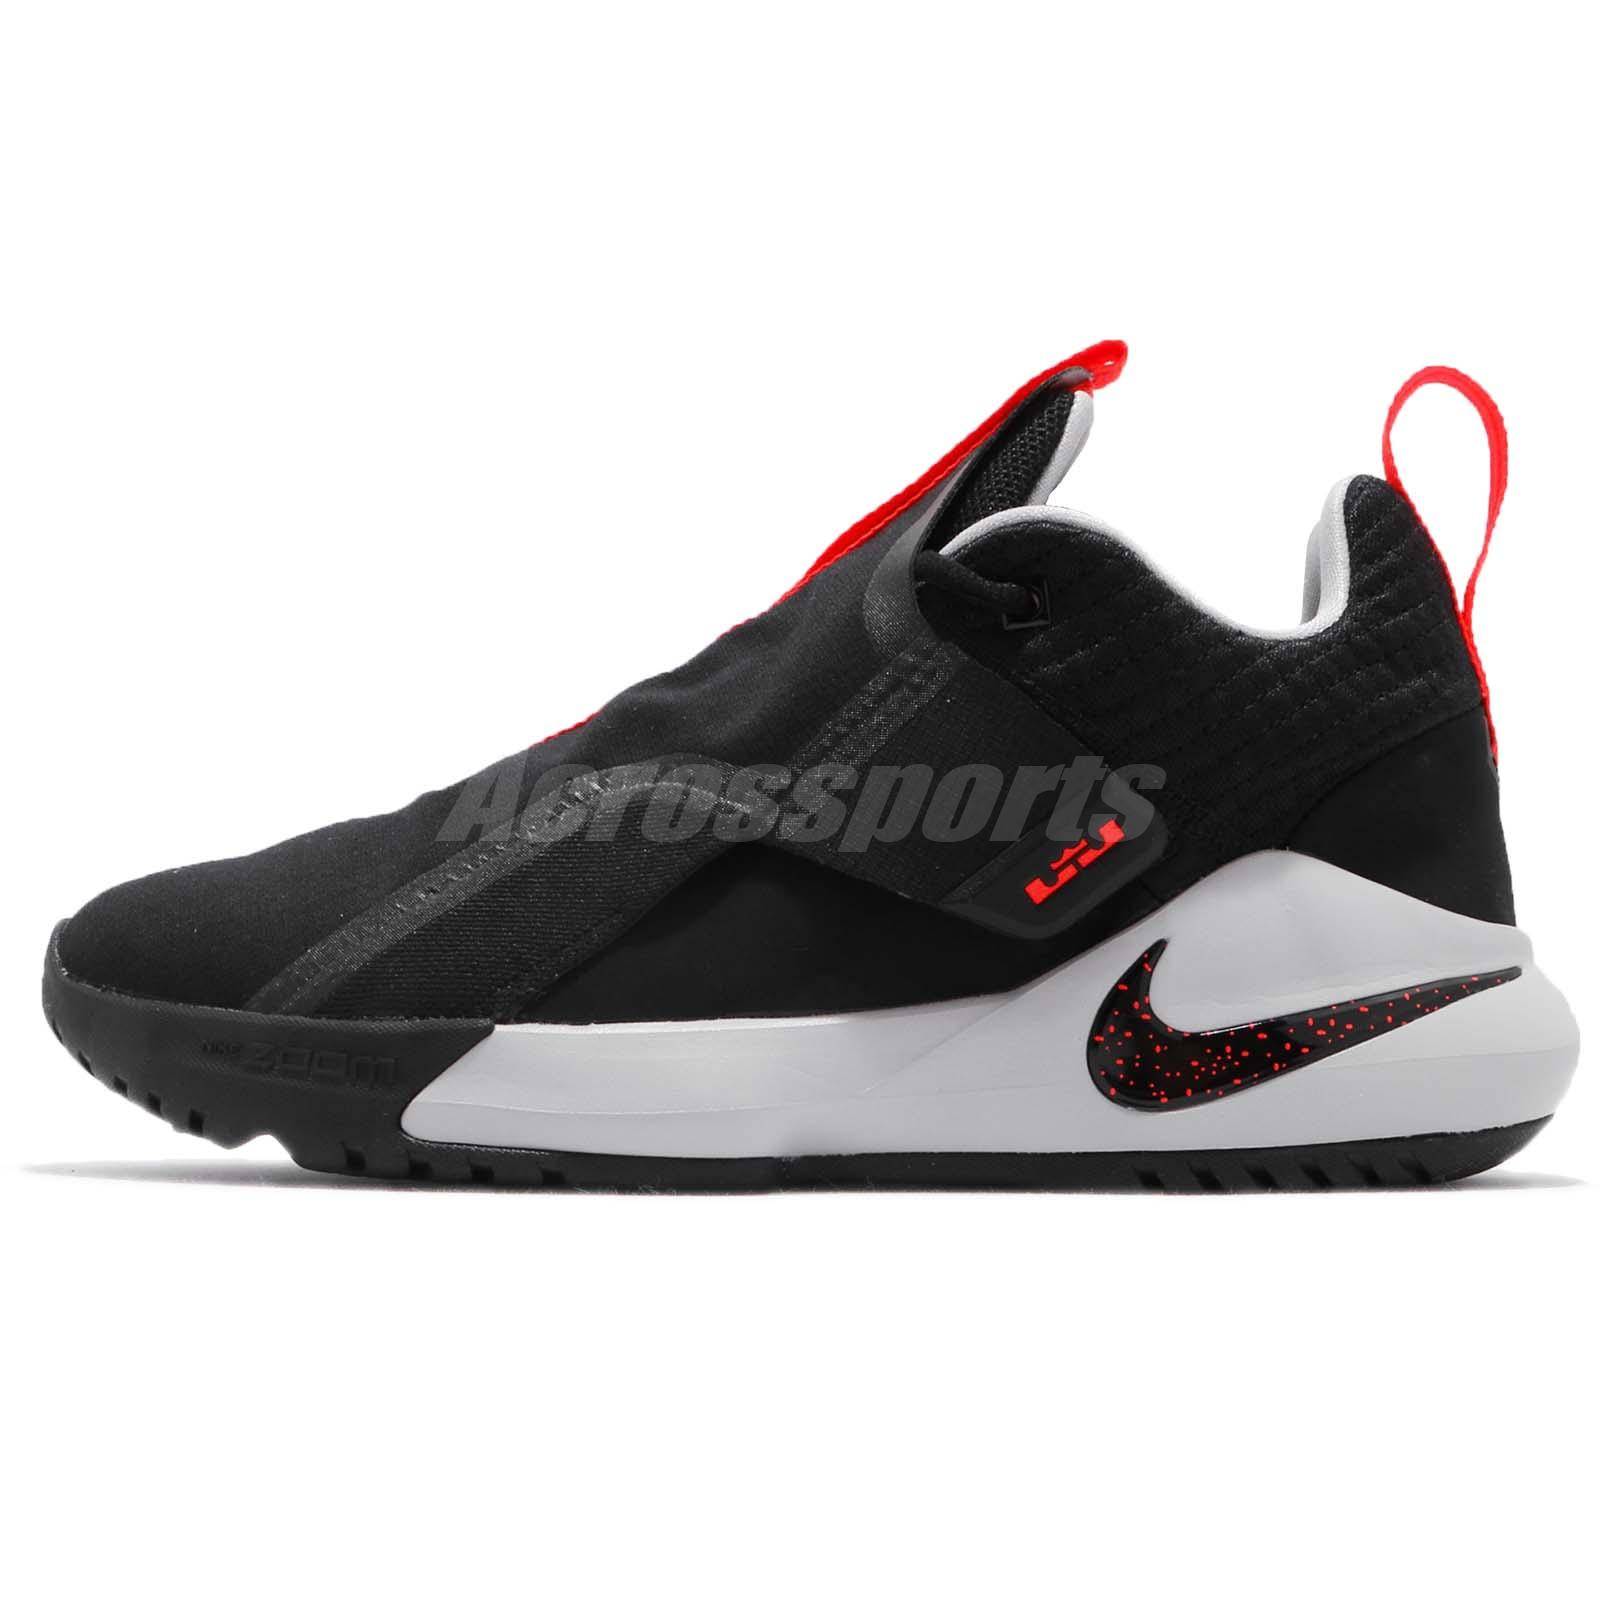 087ab330441 Nike Ambassador XI 11 Lebron James LBJ Black Crimson Grey Men Shoes AO2920- 001